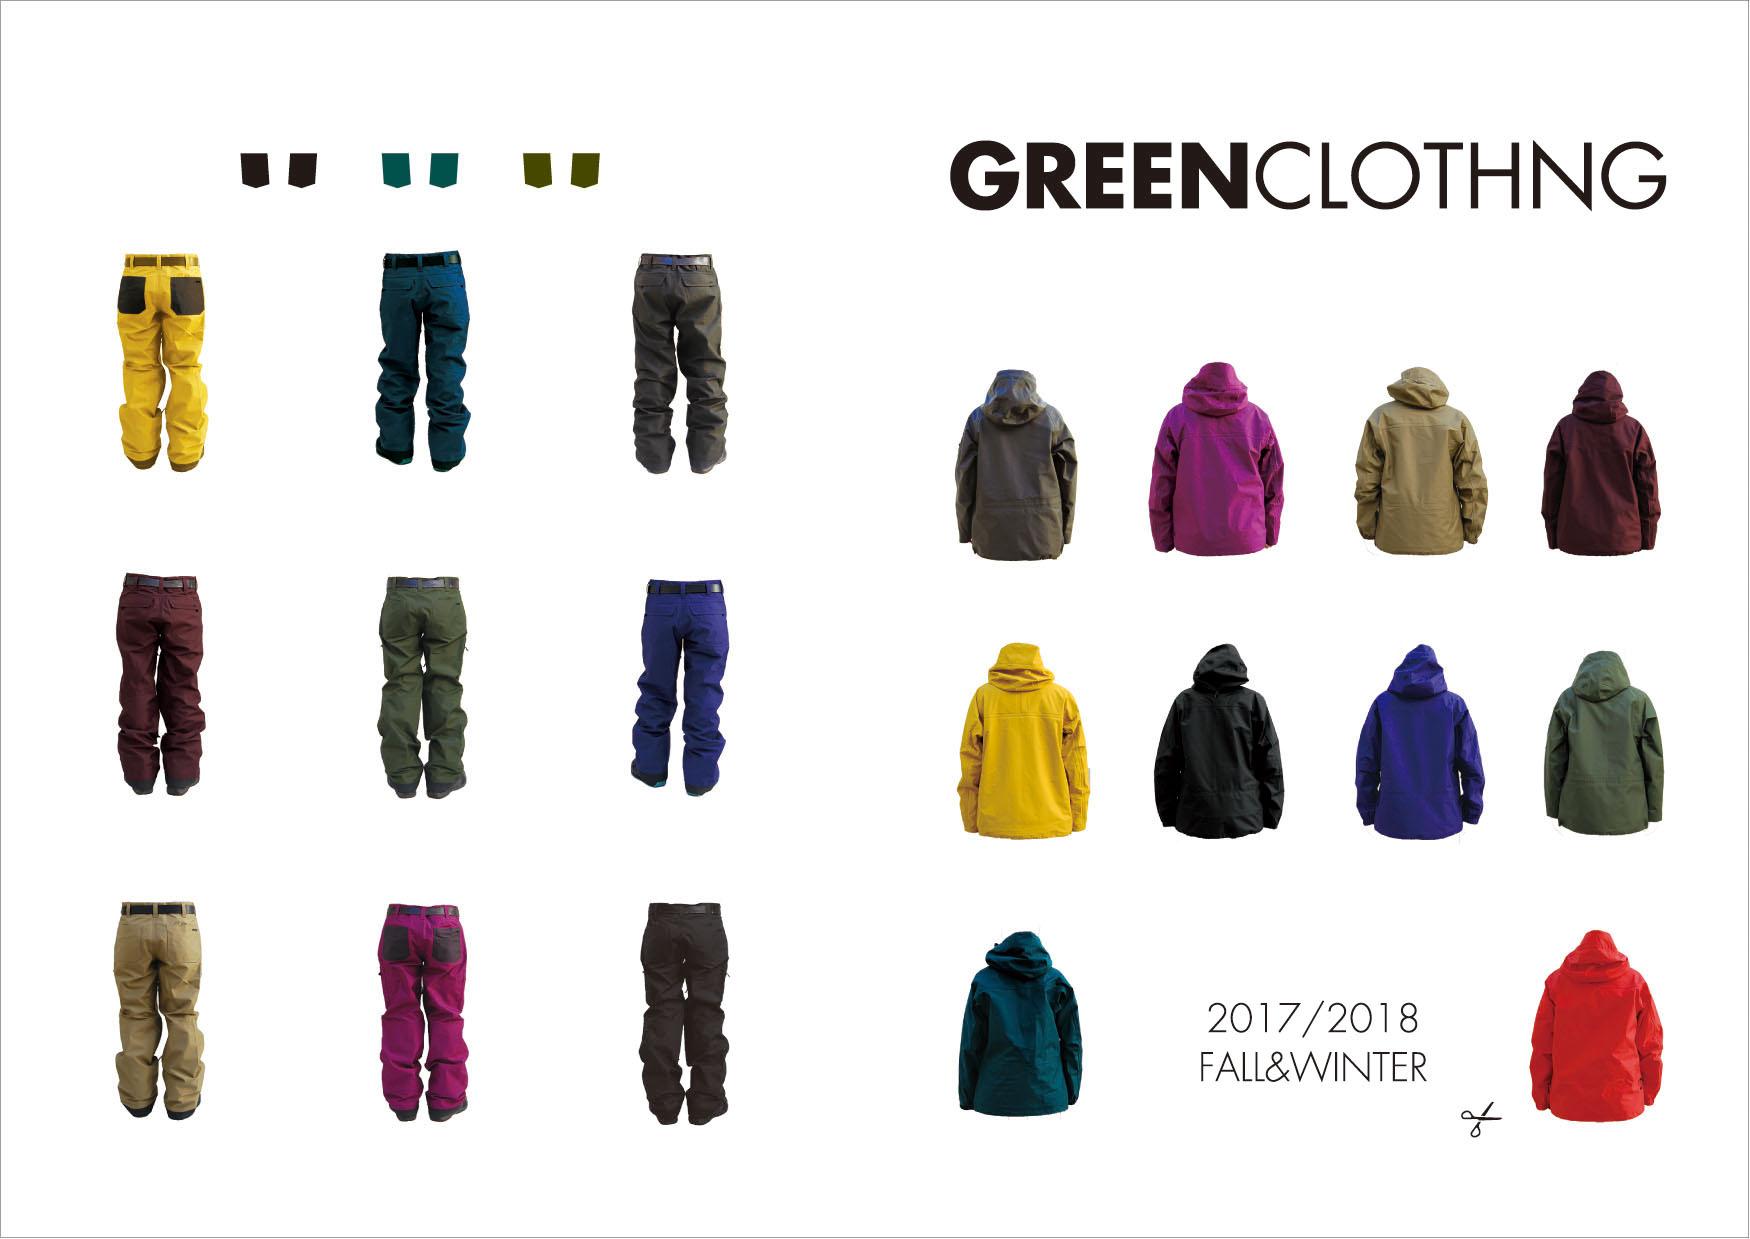 GREENCLOTHING 17-18全商品予約開始+展示受注会情報